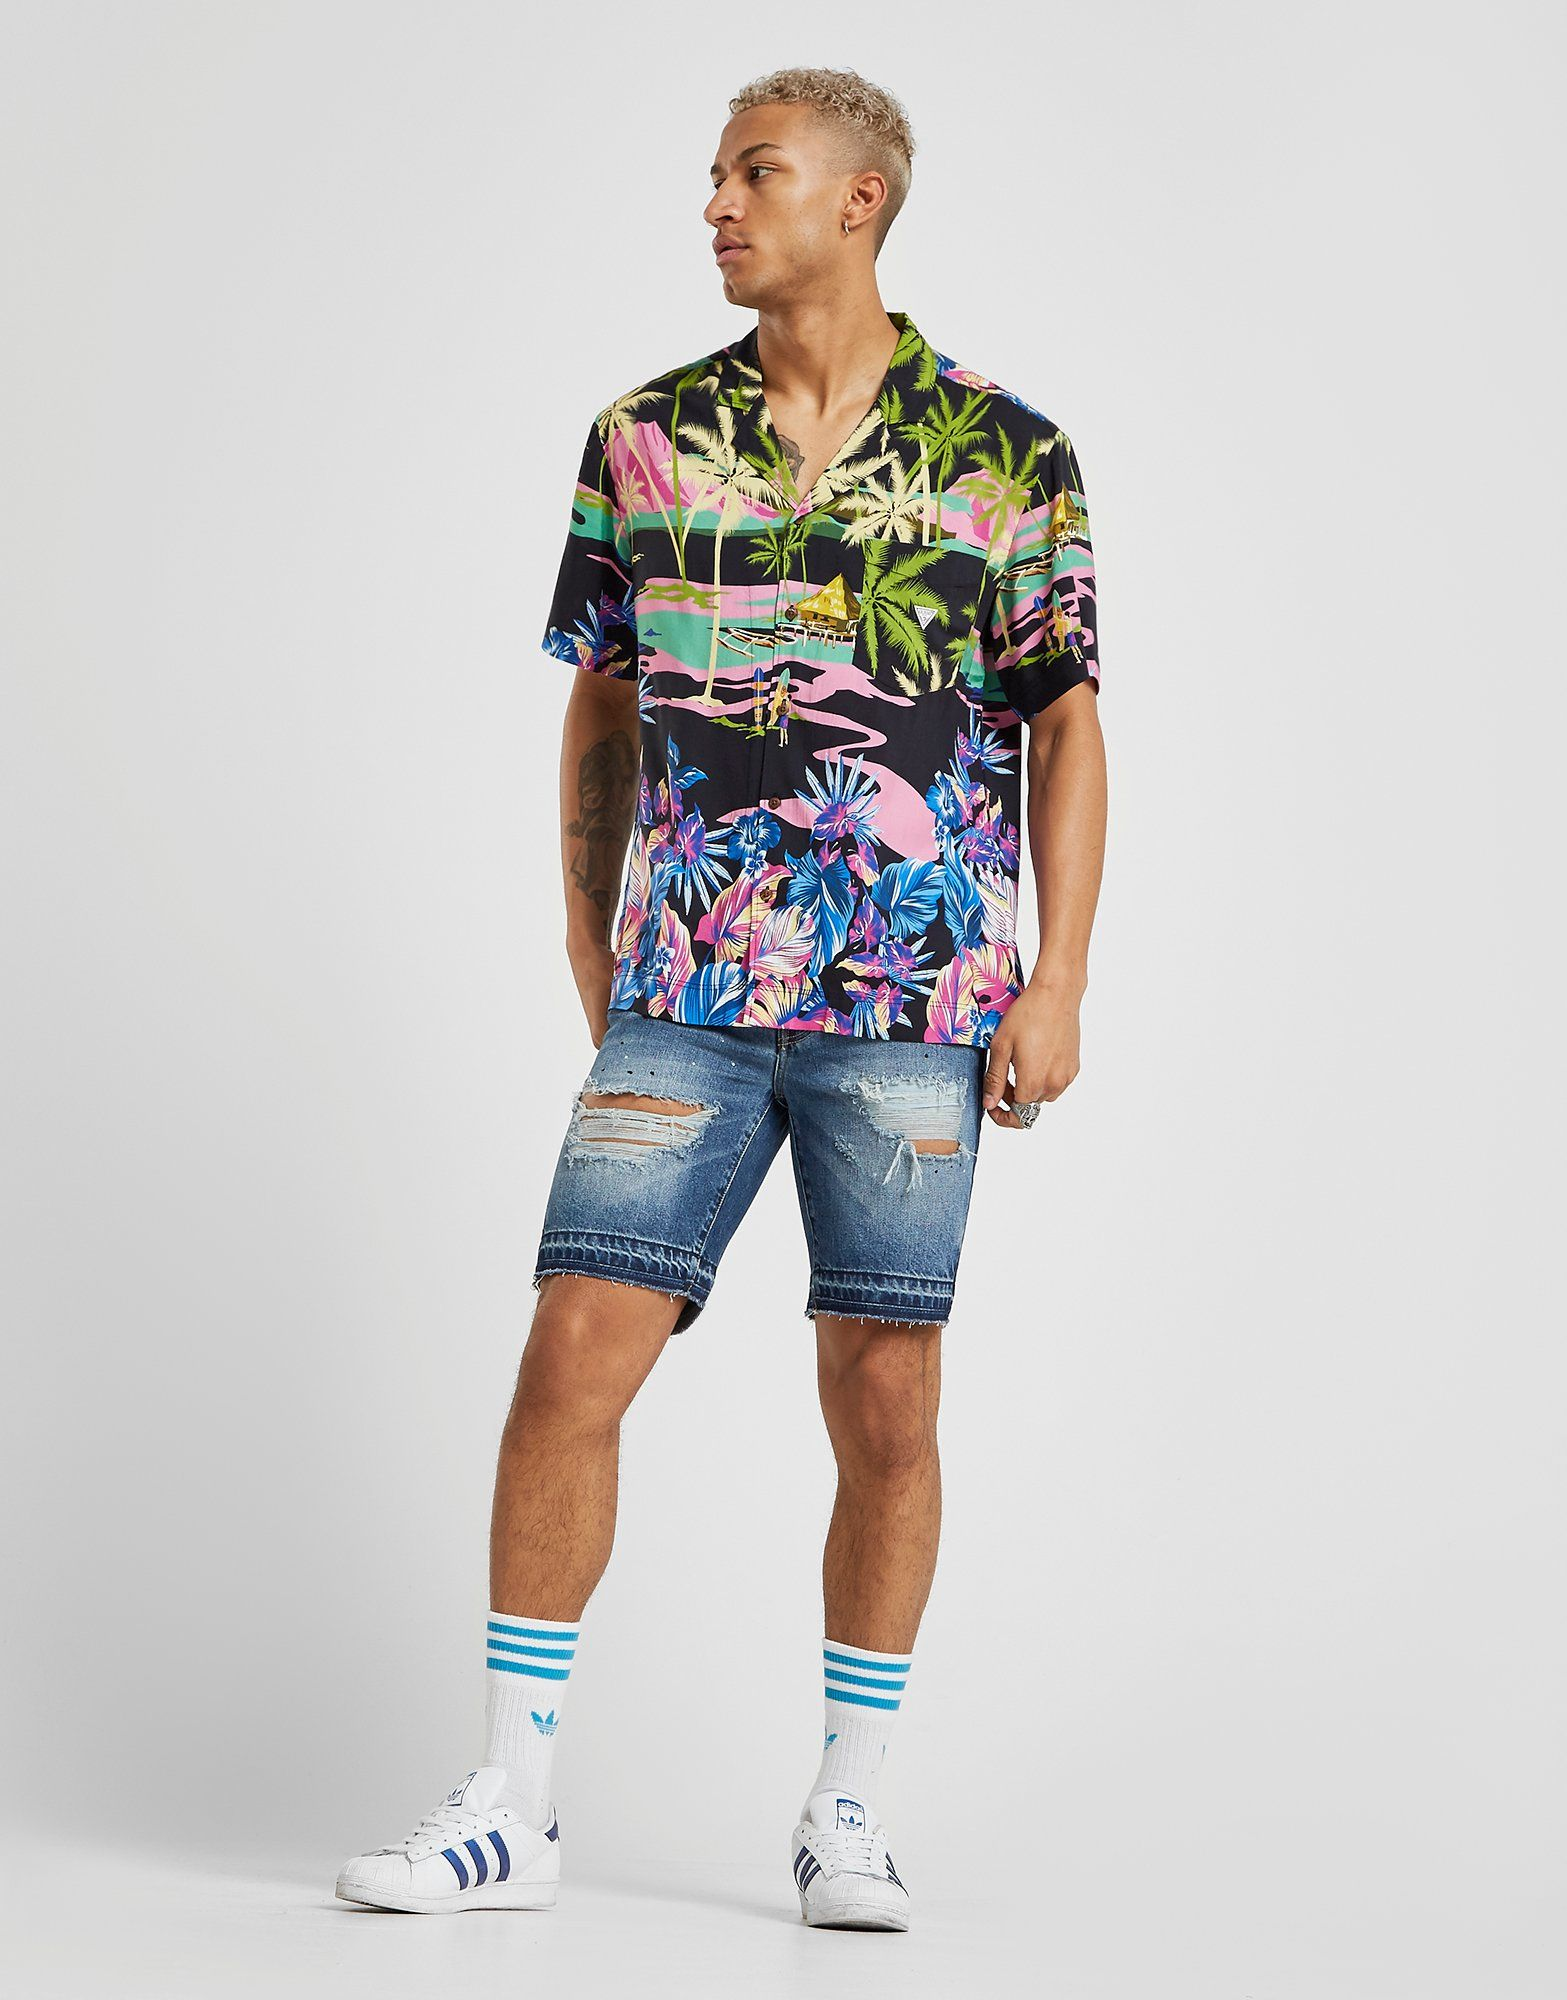 GUESS Surf All Over Print Short Sleeve Shirt